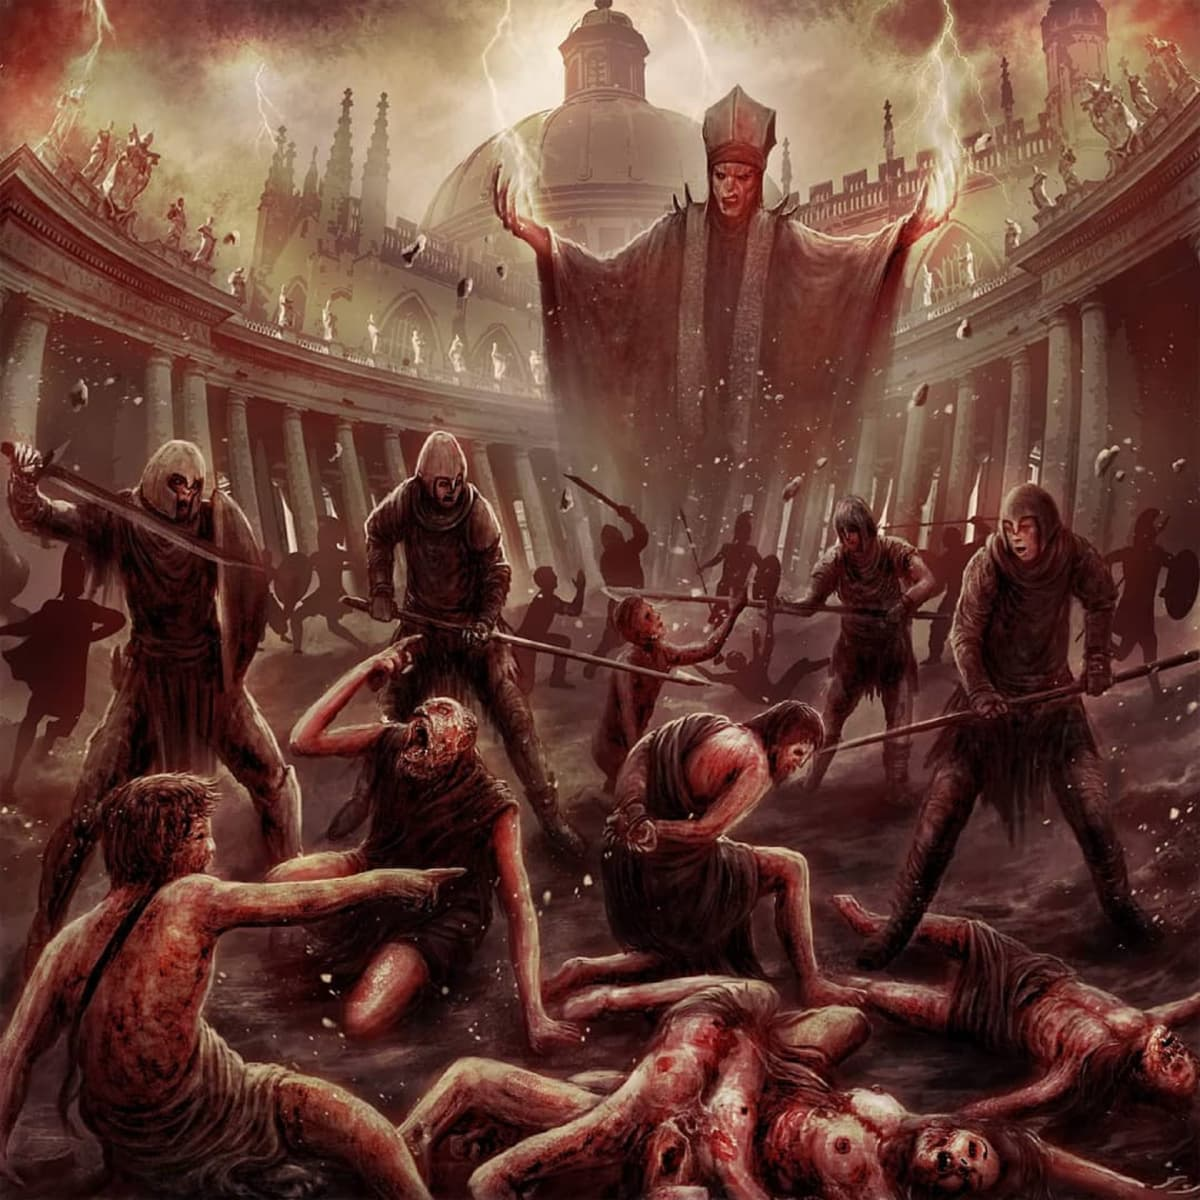 Death metal, Rudi Gorgingsuicide Art Yanto, Damned By The Pope